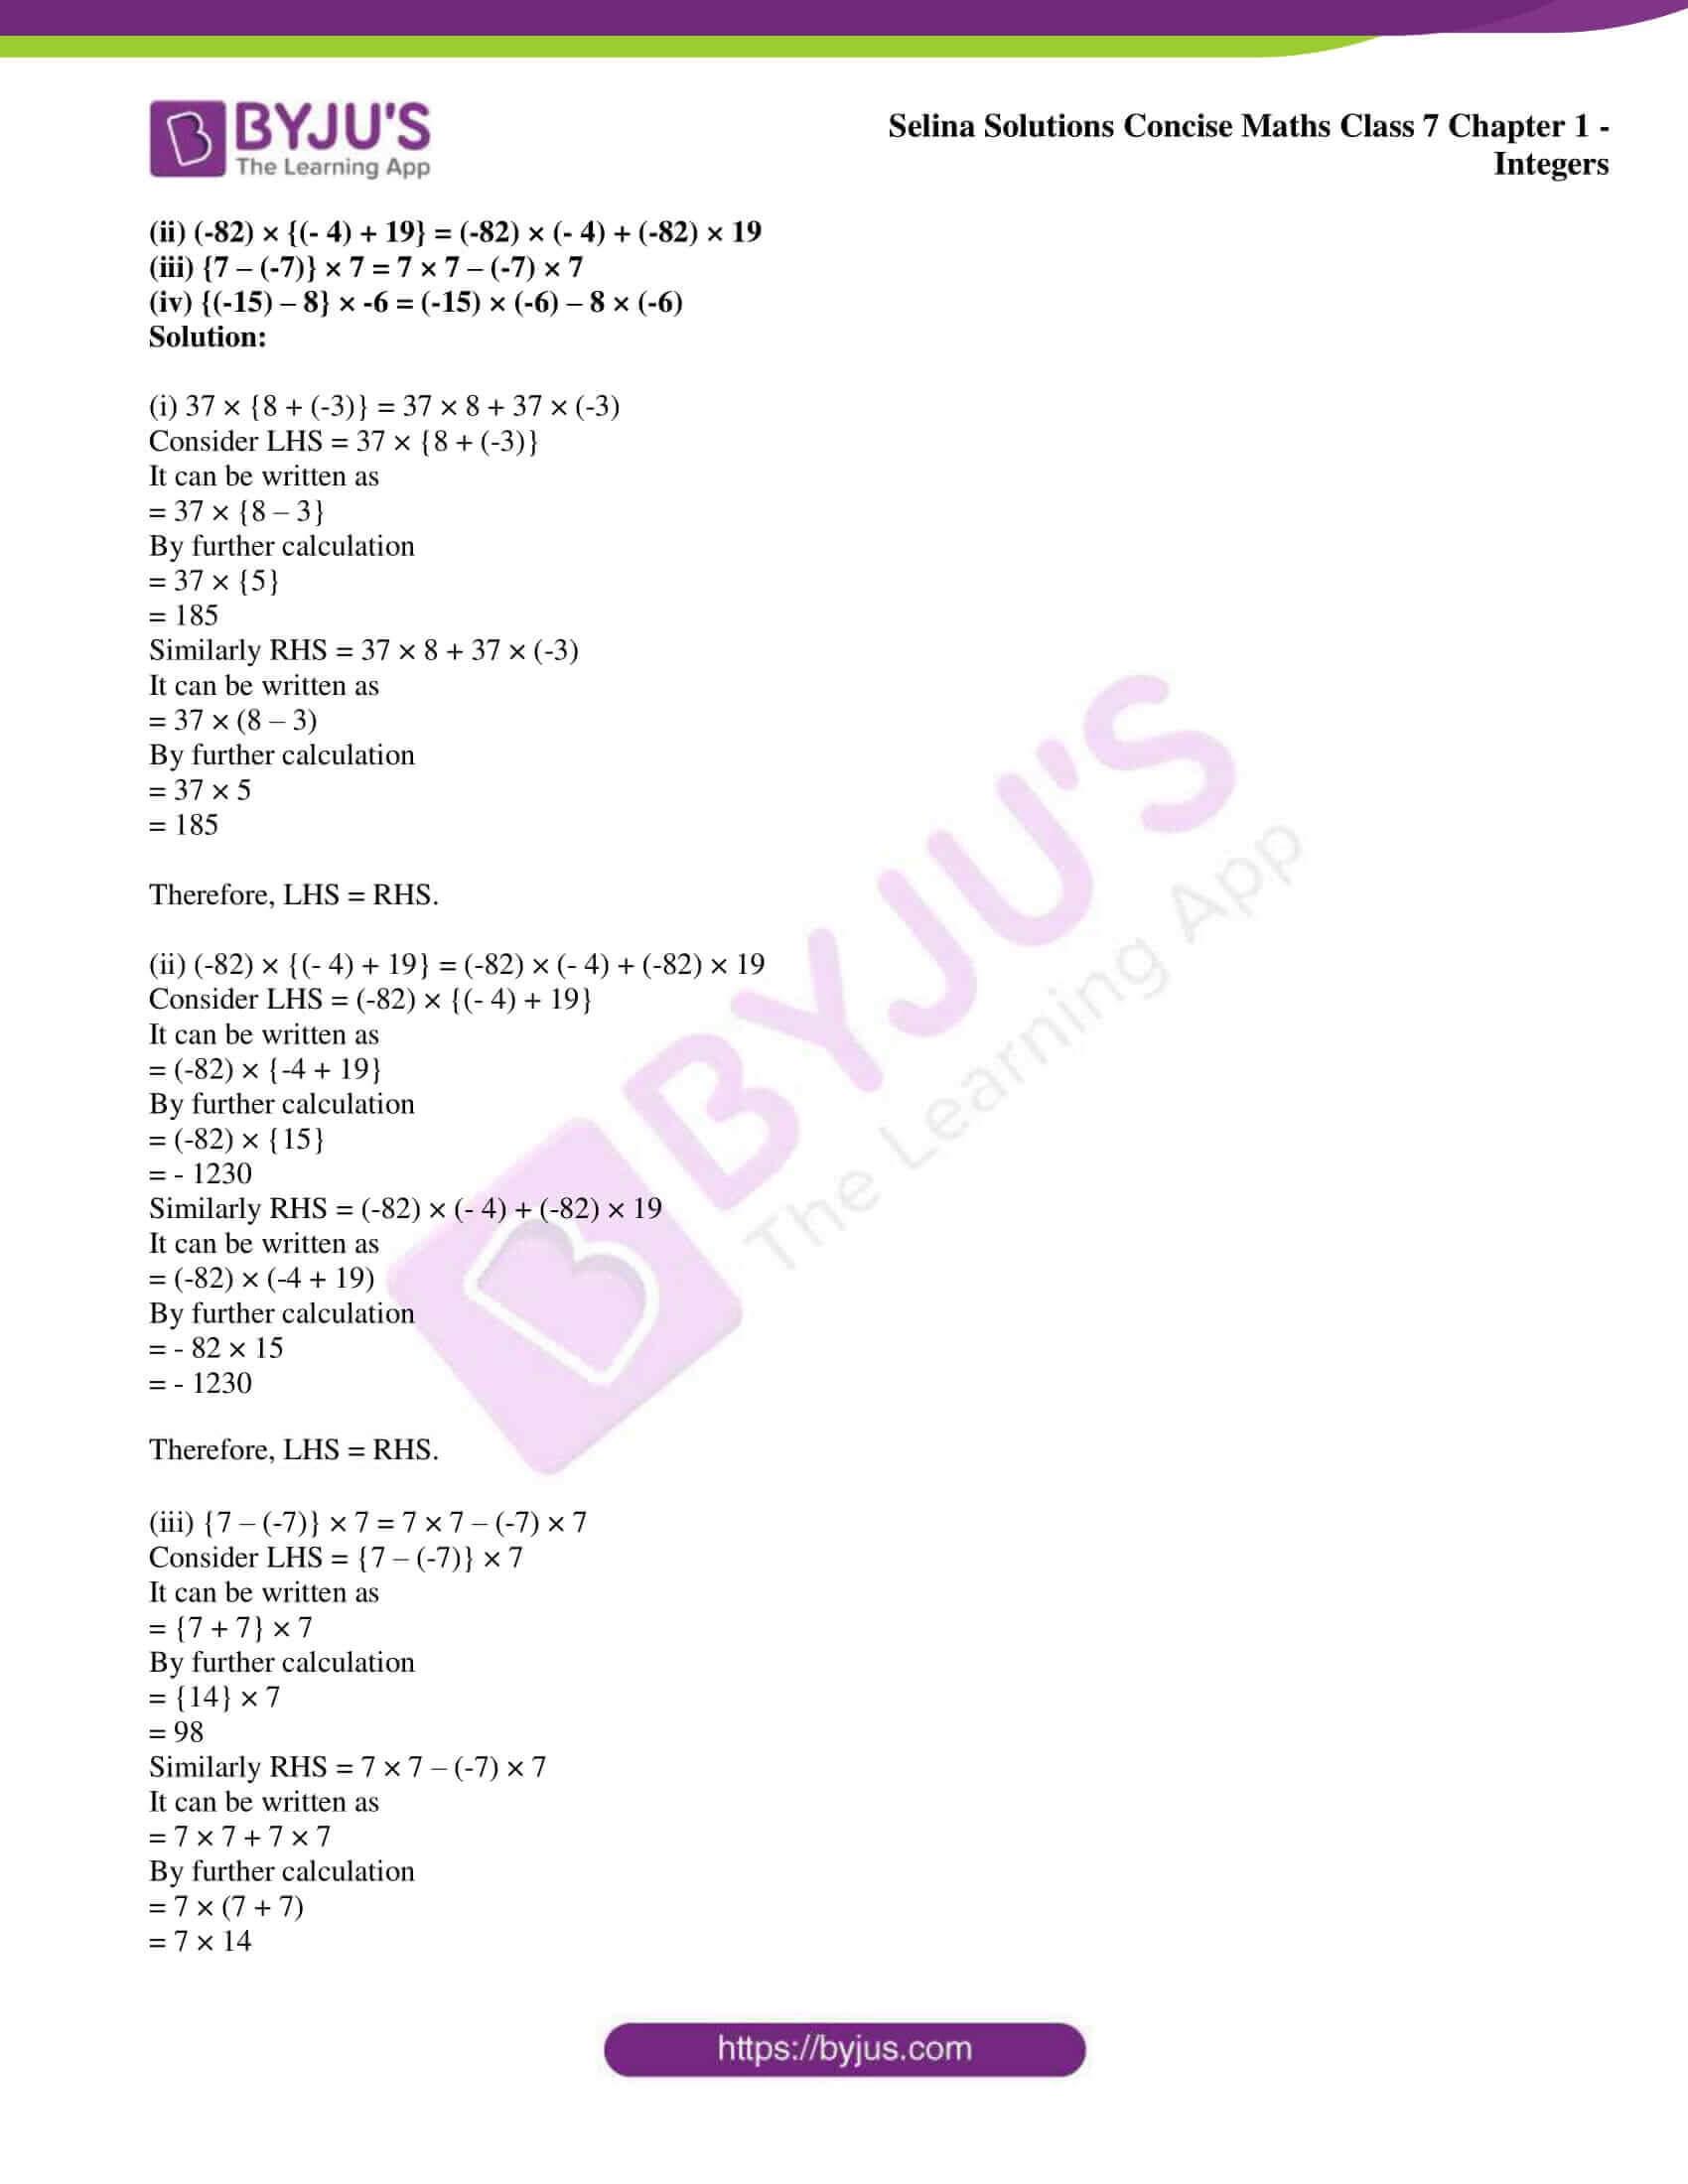 selina sol concise maths class 7 ch1 ex 1a 2